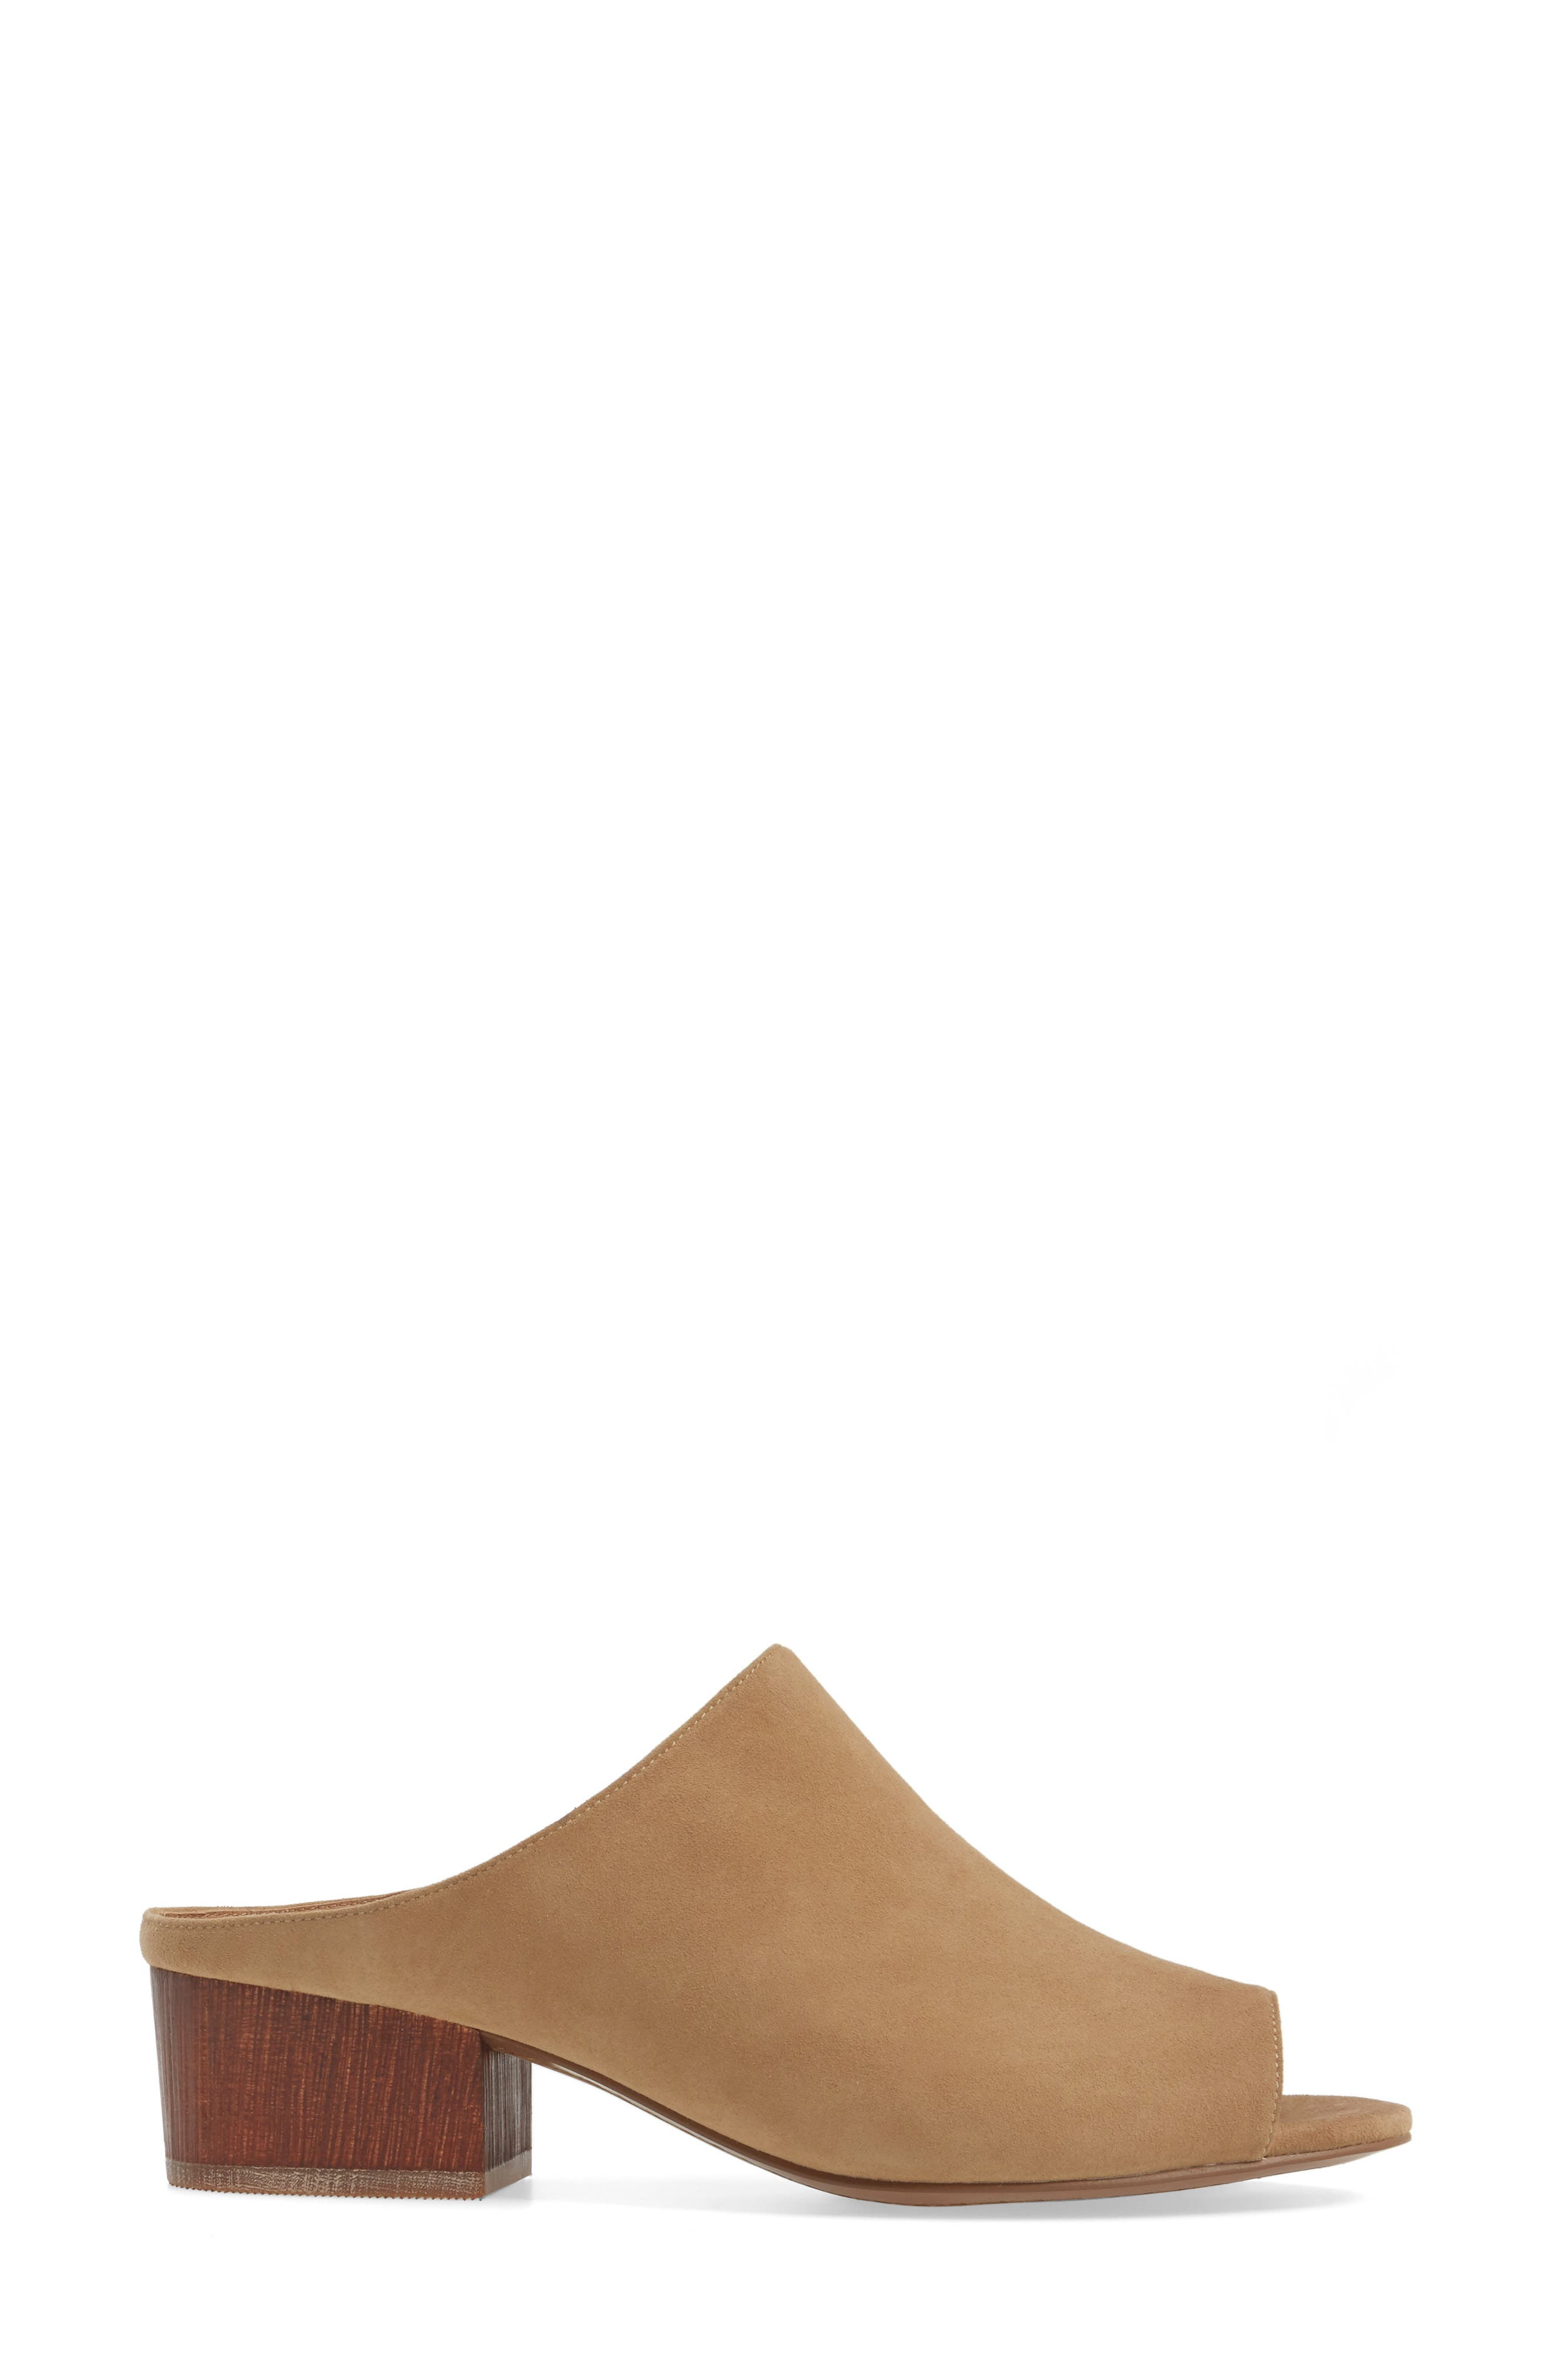 Cinch Block Heel Mule,                             Alternate thumbnail 3, color,                             Tan Suede